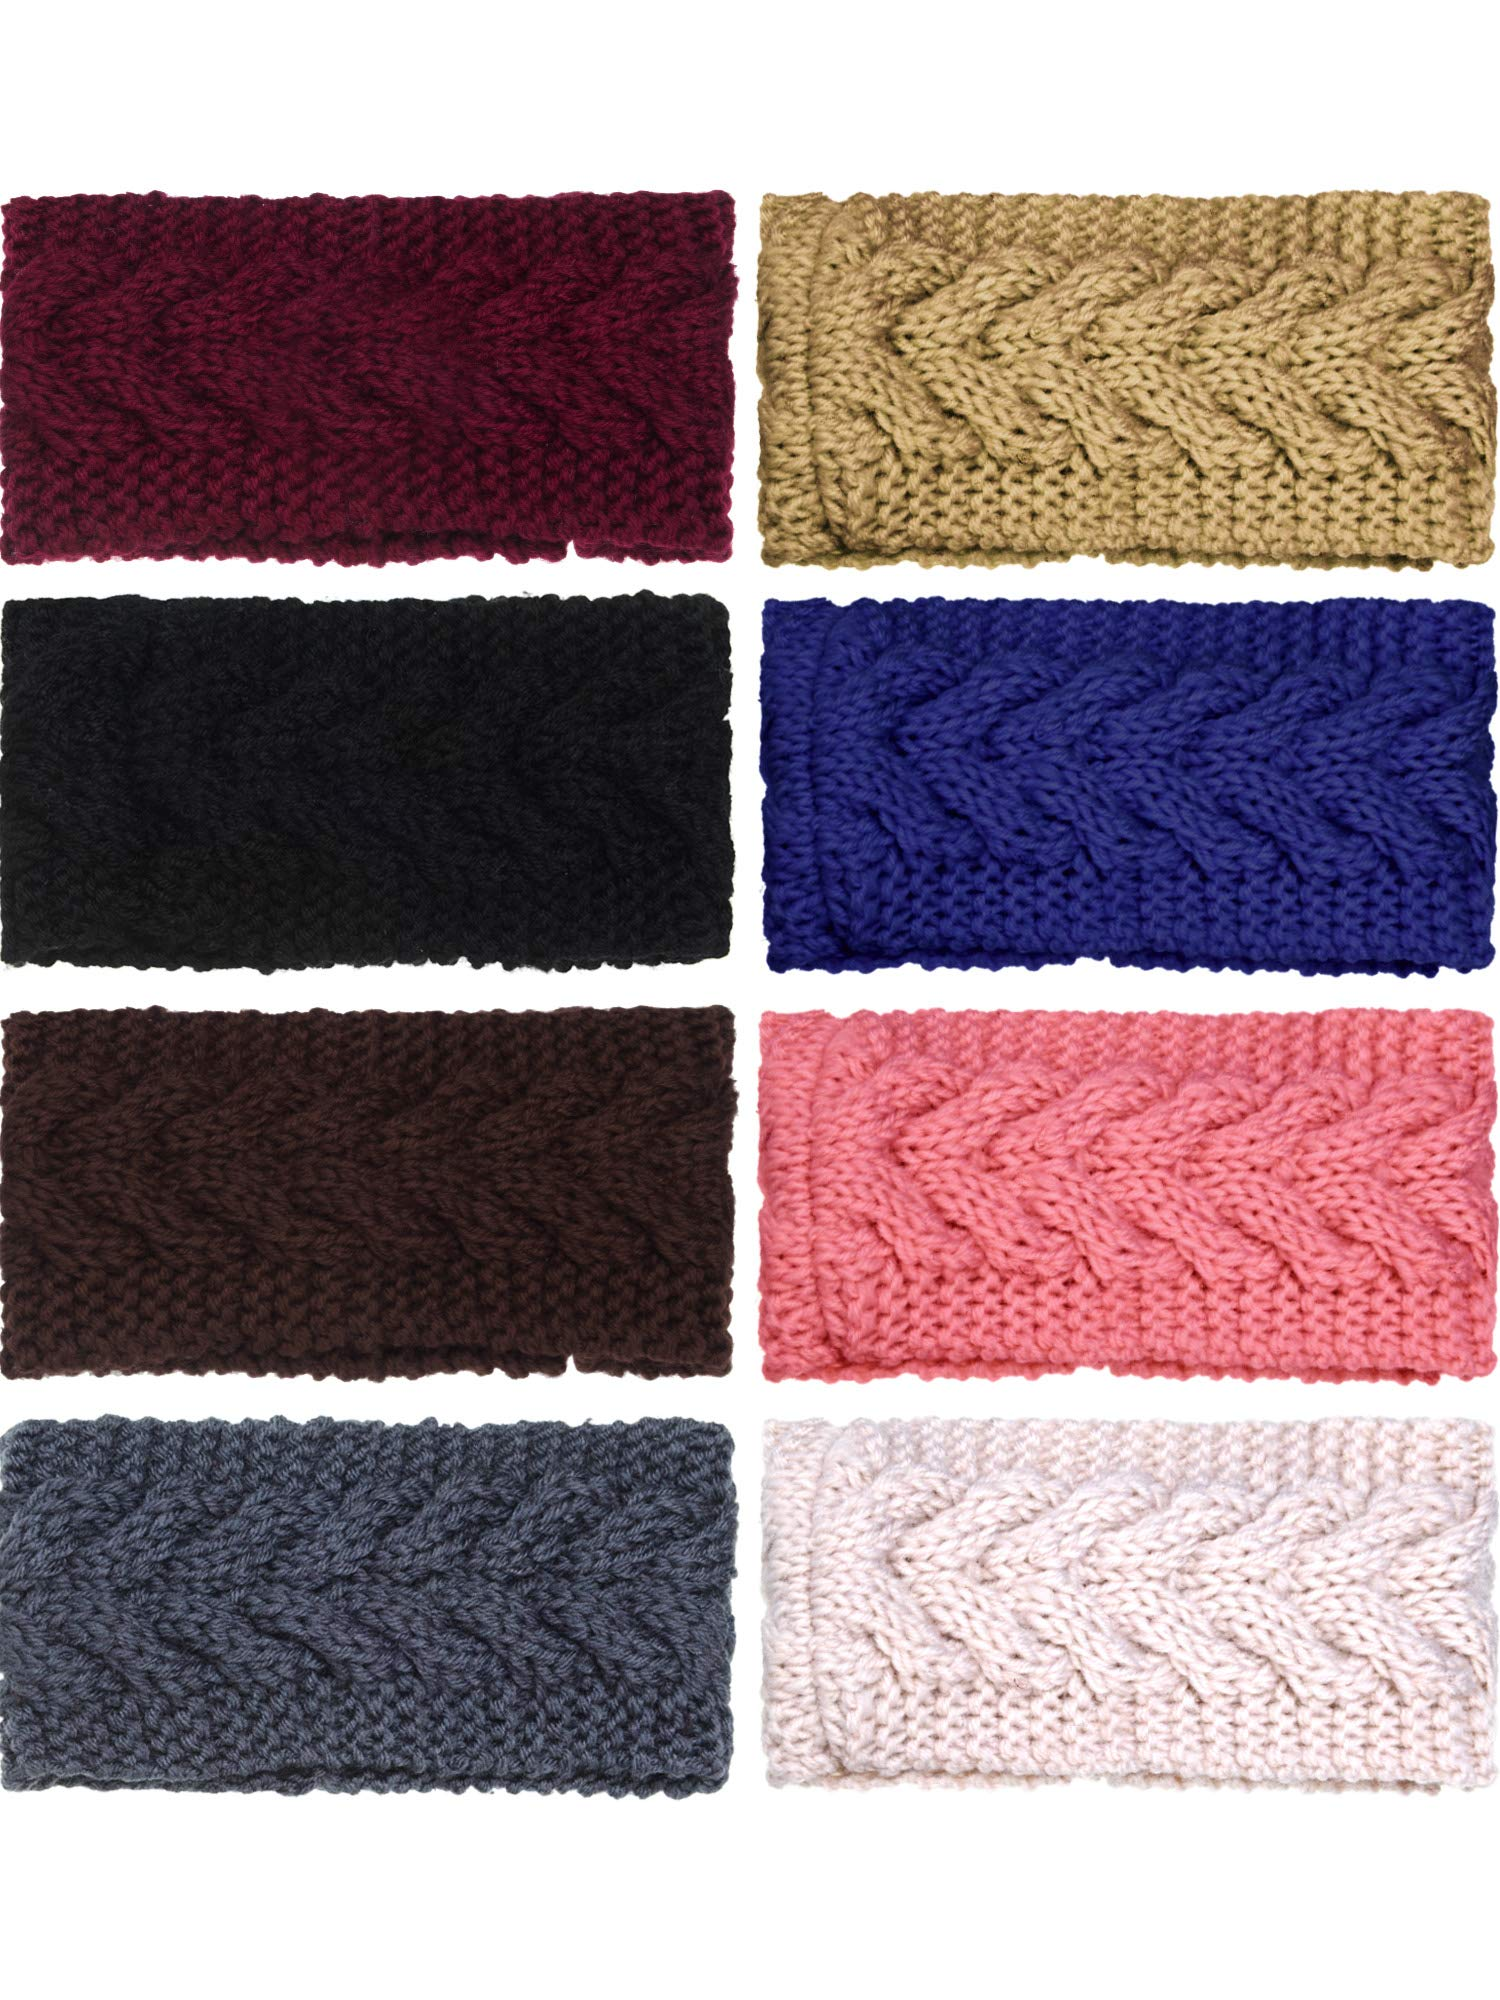 TecUnite 8 Pieces Chunky Knit Headband Crochet Headbands Crochet Braided Hair Band Versatile Winter Ear Warmer for Women Girls